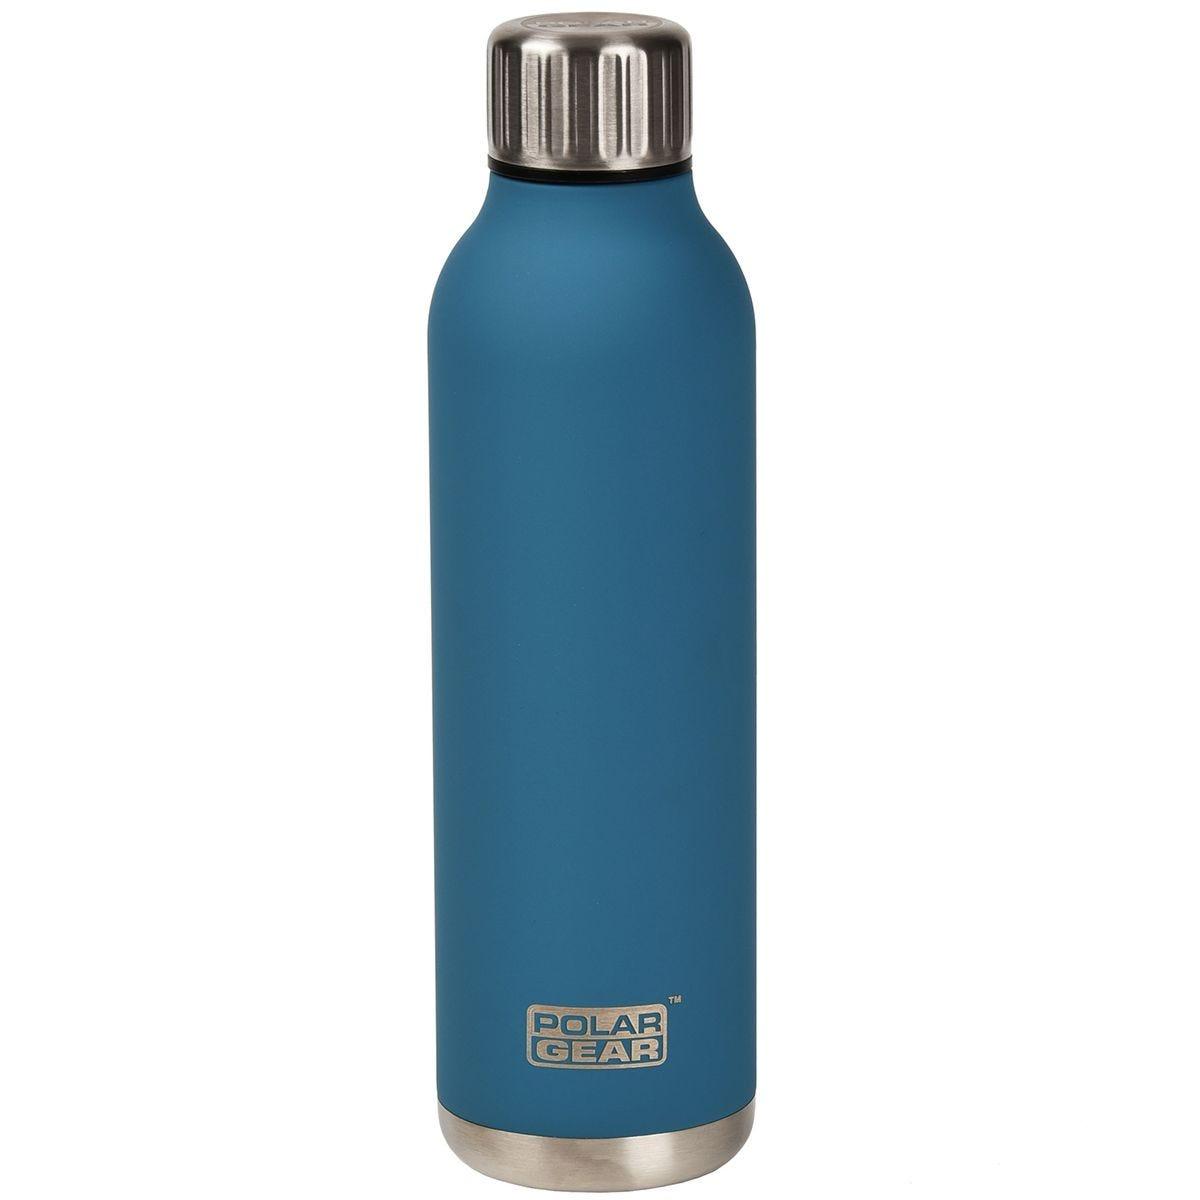 Polar Gear Orion 500ml Stainless Steel Bottle - Blue